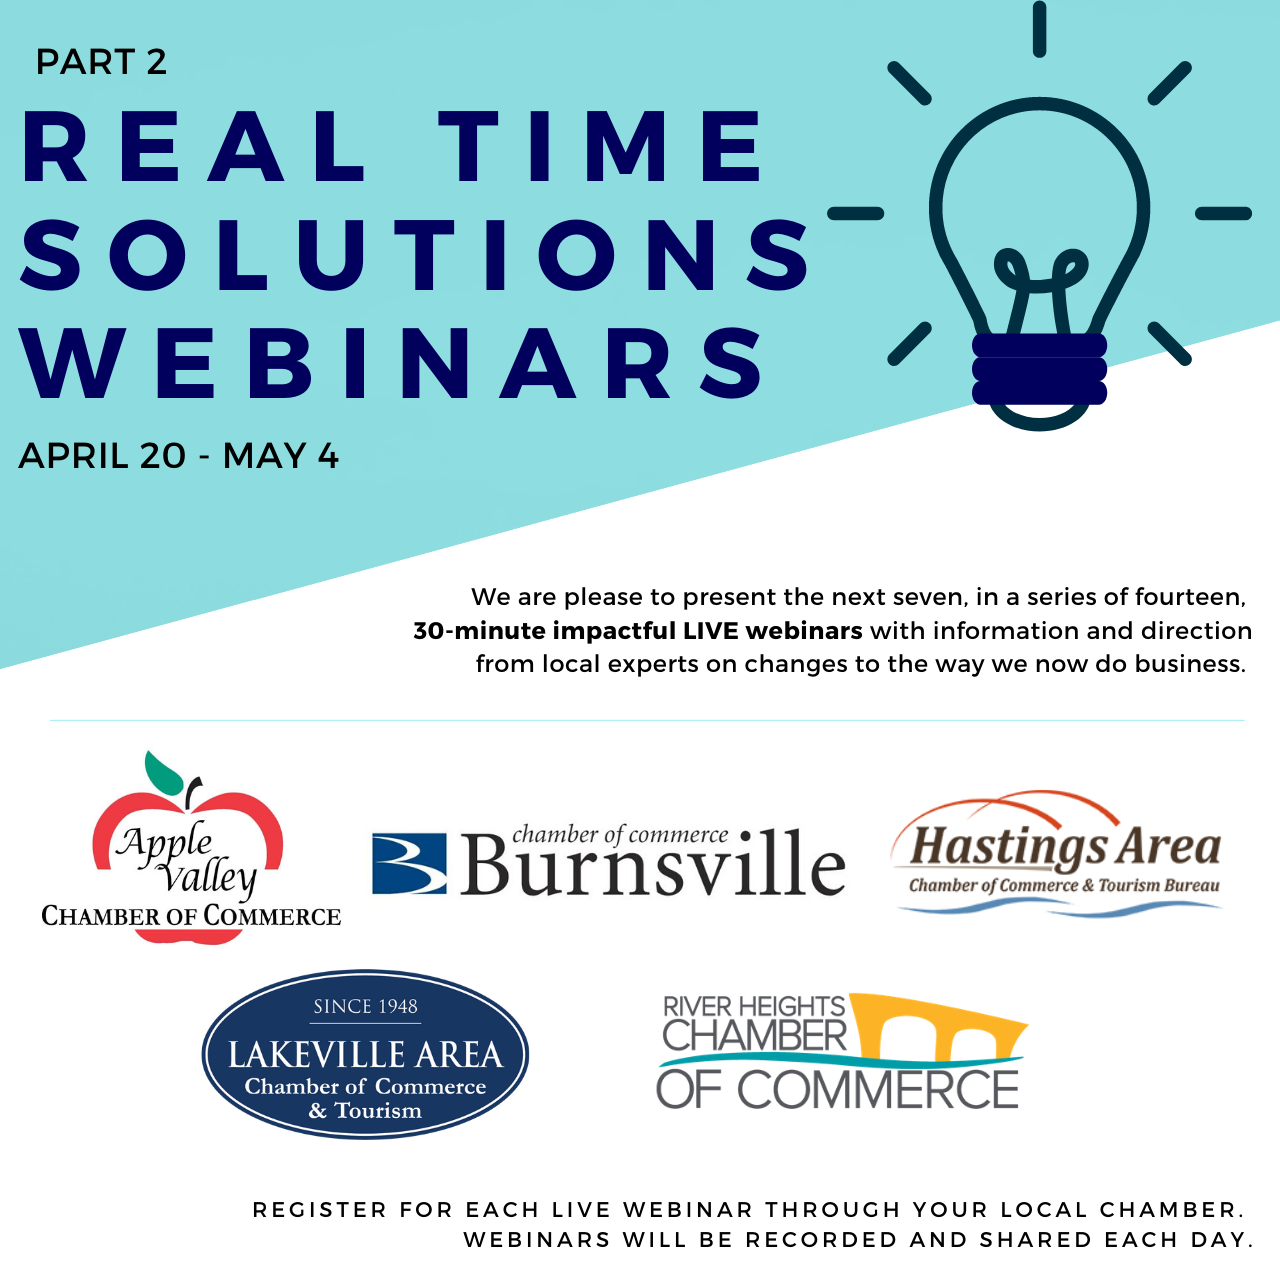 Realtime-Solutions-Webinars---April-20th---May-4th.png